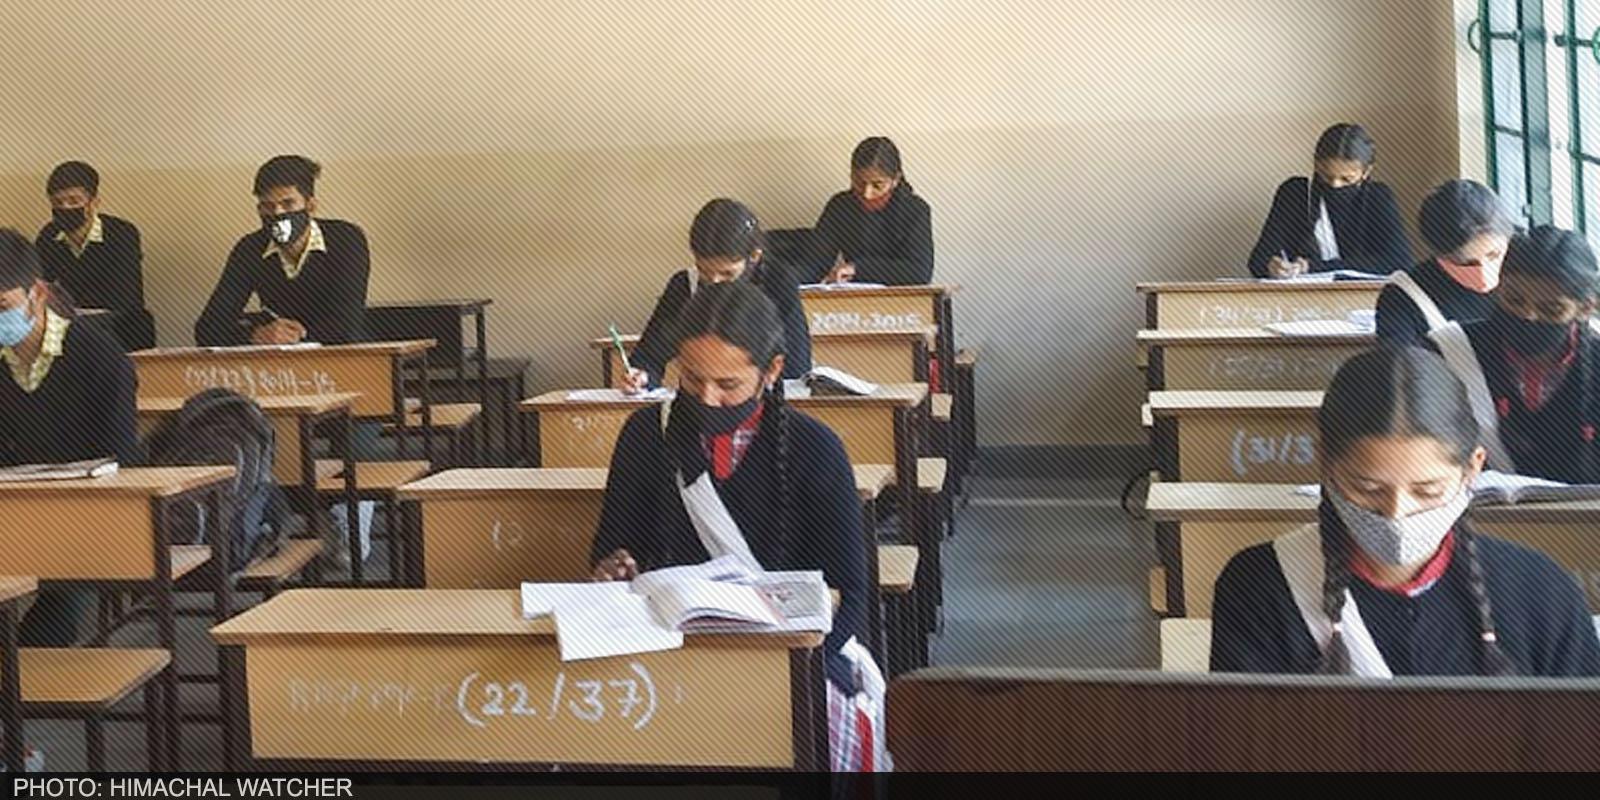 college and board exams in himachal pradesh postponed